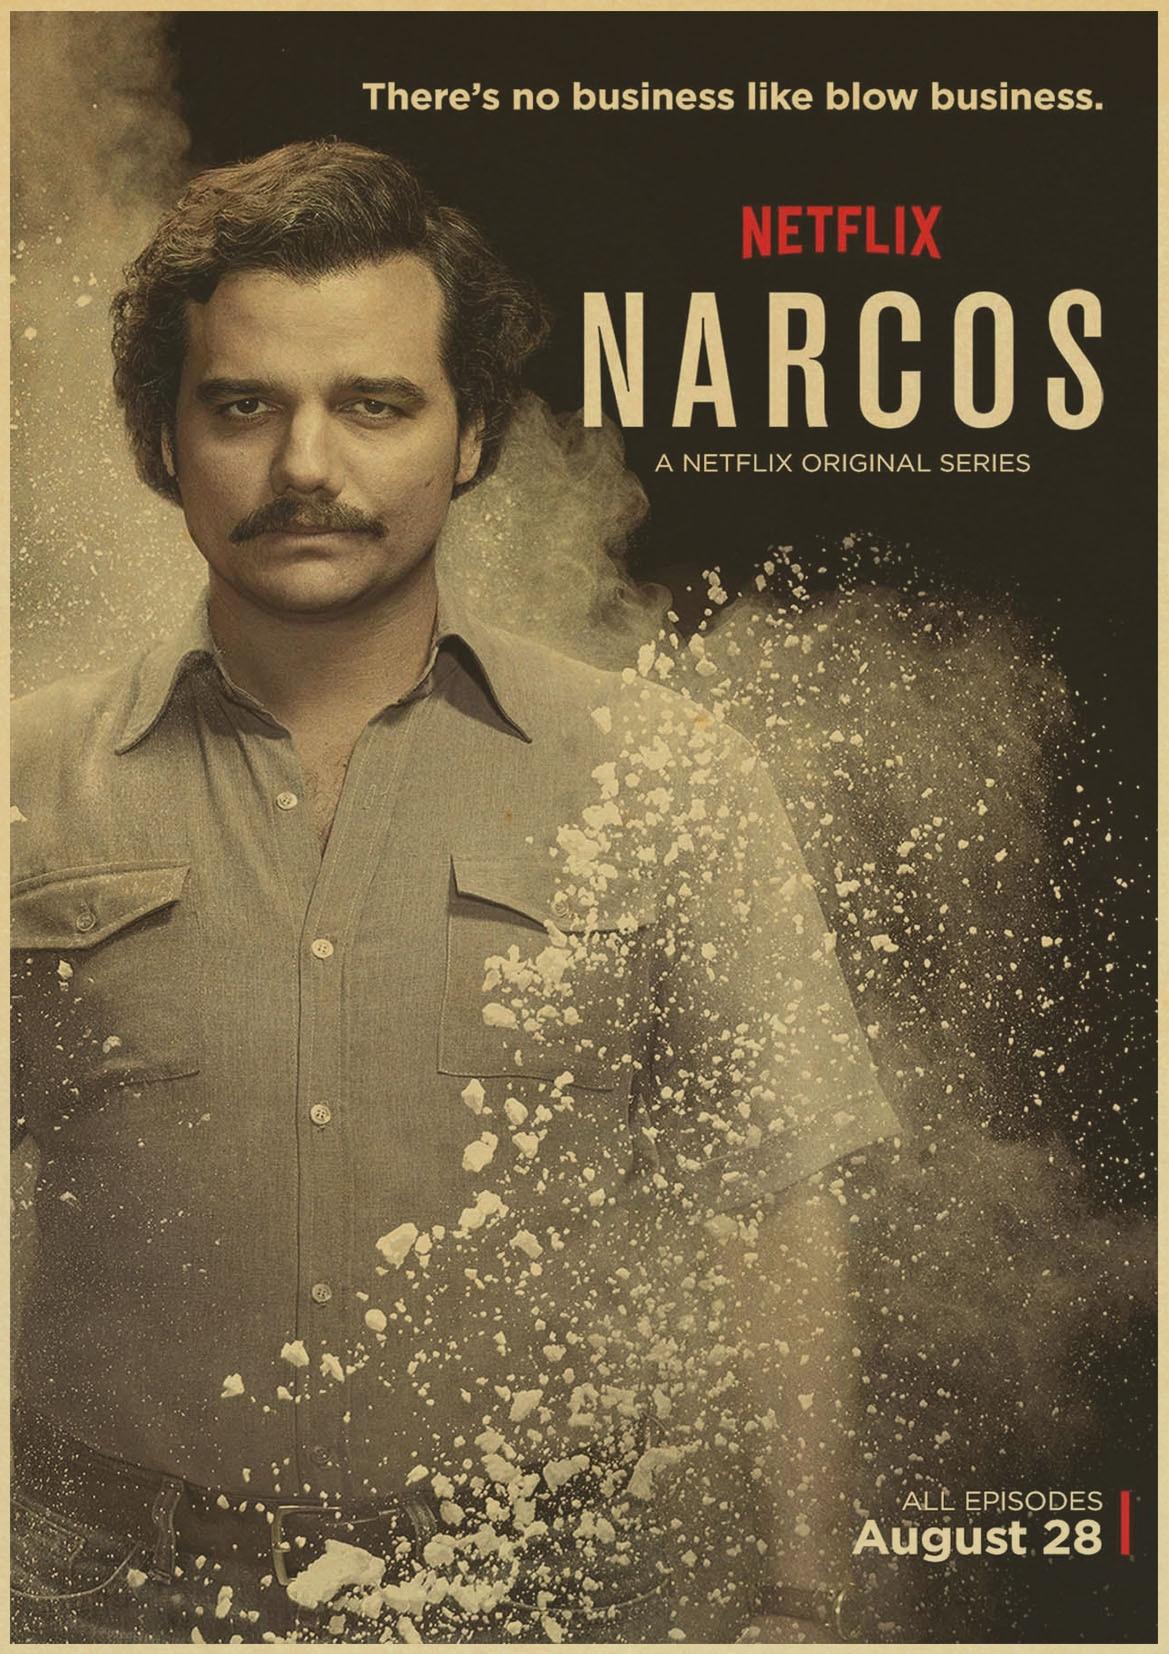 Steve murphy crimen columbia season narcos tv serie vintage poster decorativo di